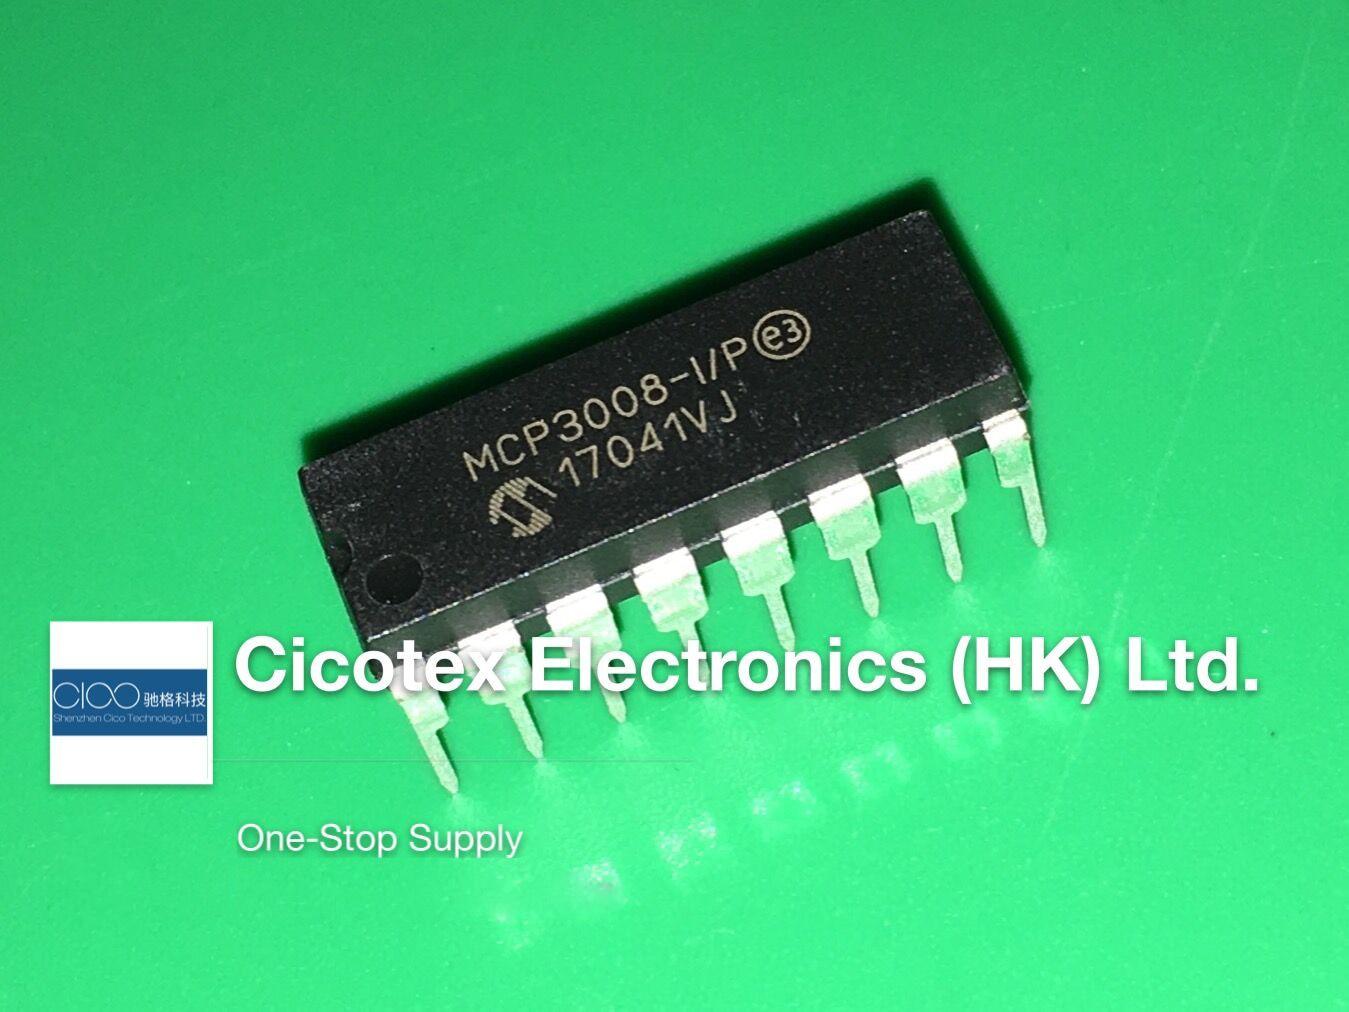 Dkr200ab60 Diode Module Dkr200ab 60 In Integrated Circuits From 10pcs Ams1117 33v 1a Voltage Regulator Electrodragon 2pcs Lot Mcp3008 I P Ic Adc 10bit 27v 8ch Spi 16dip